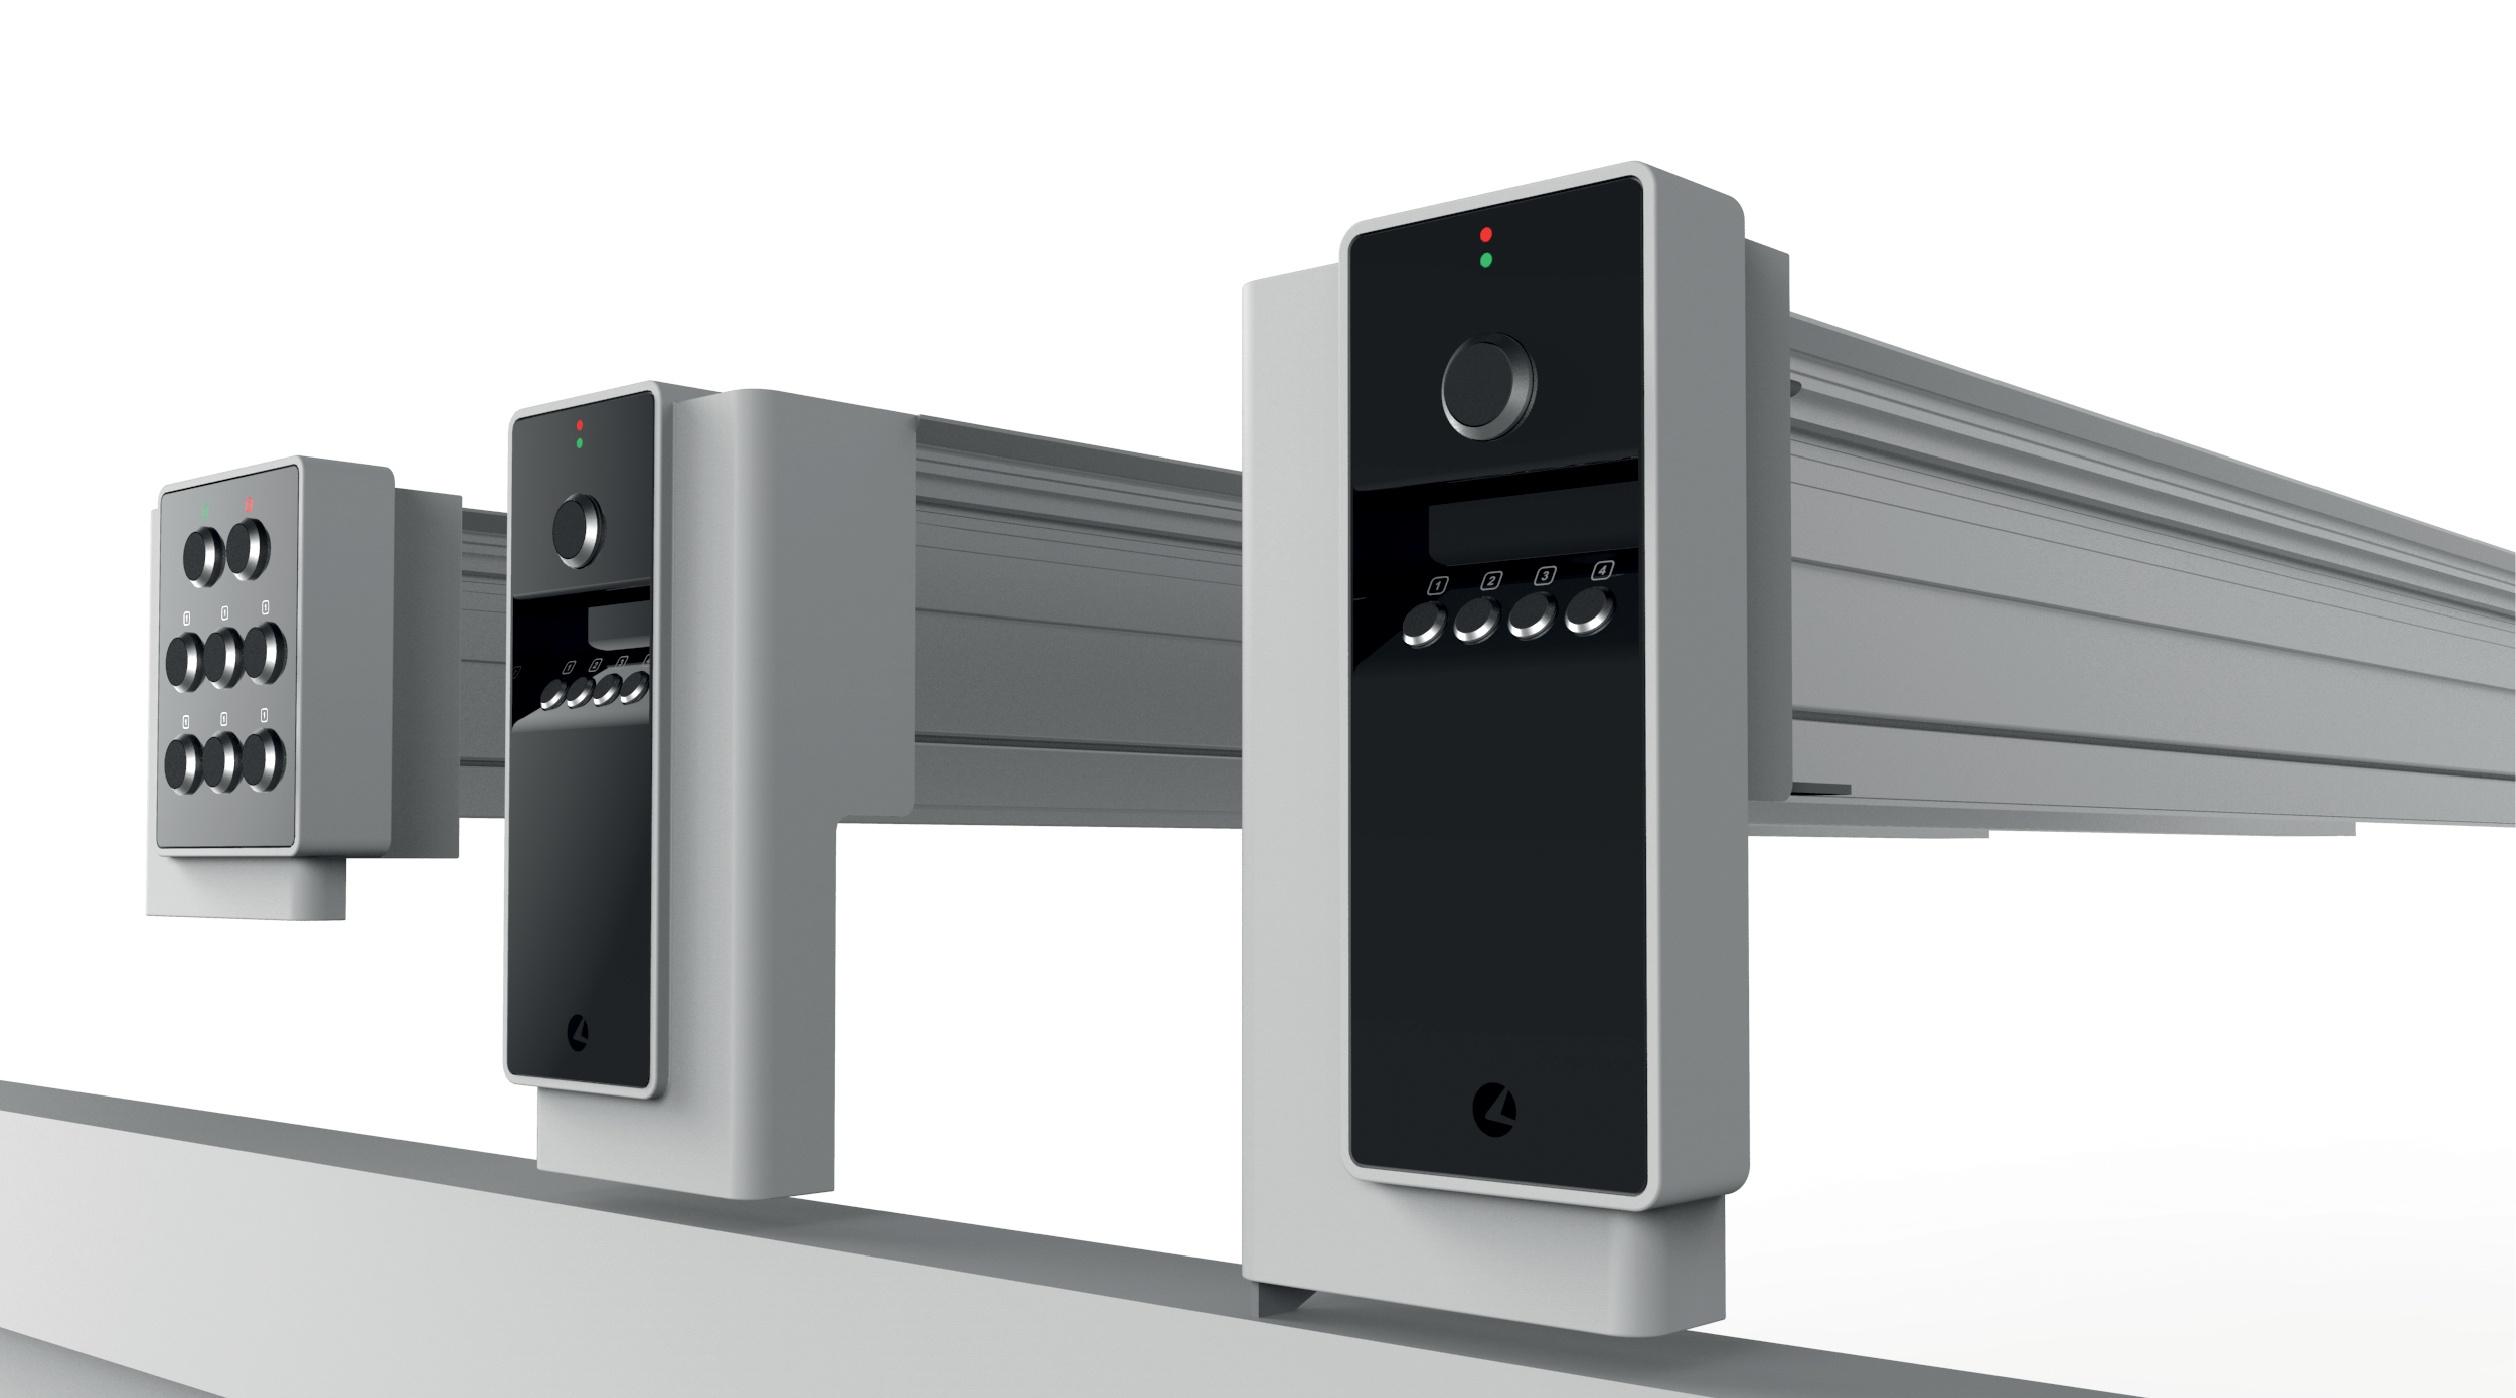 Engeenering e Design per Dispositivo di Controllo SCM Group